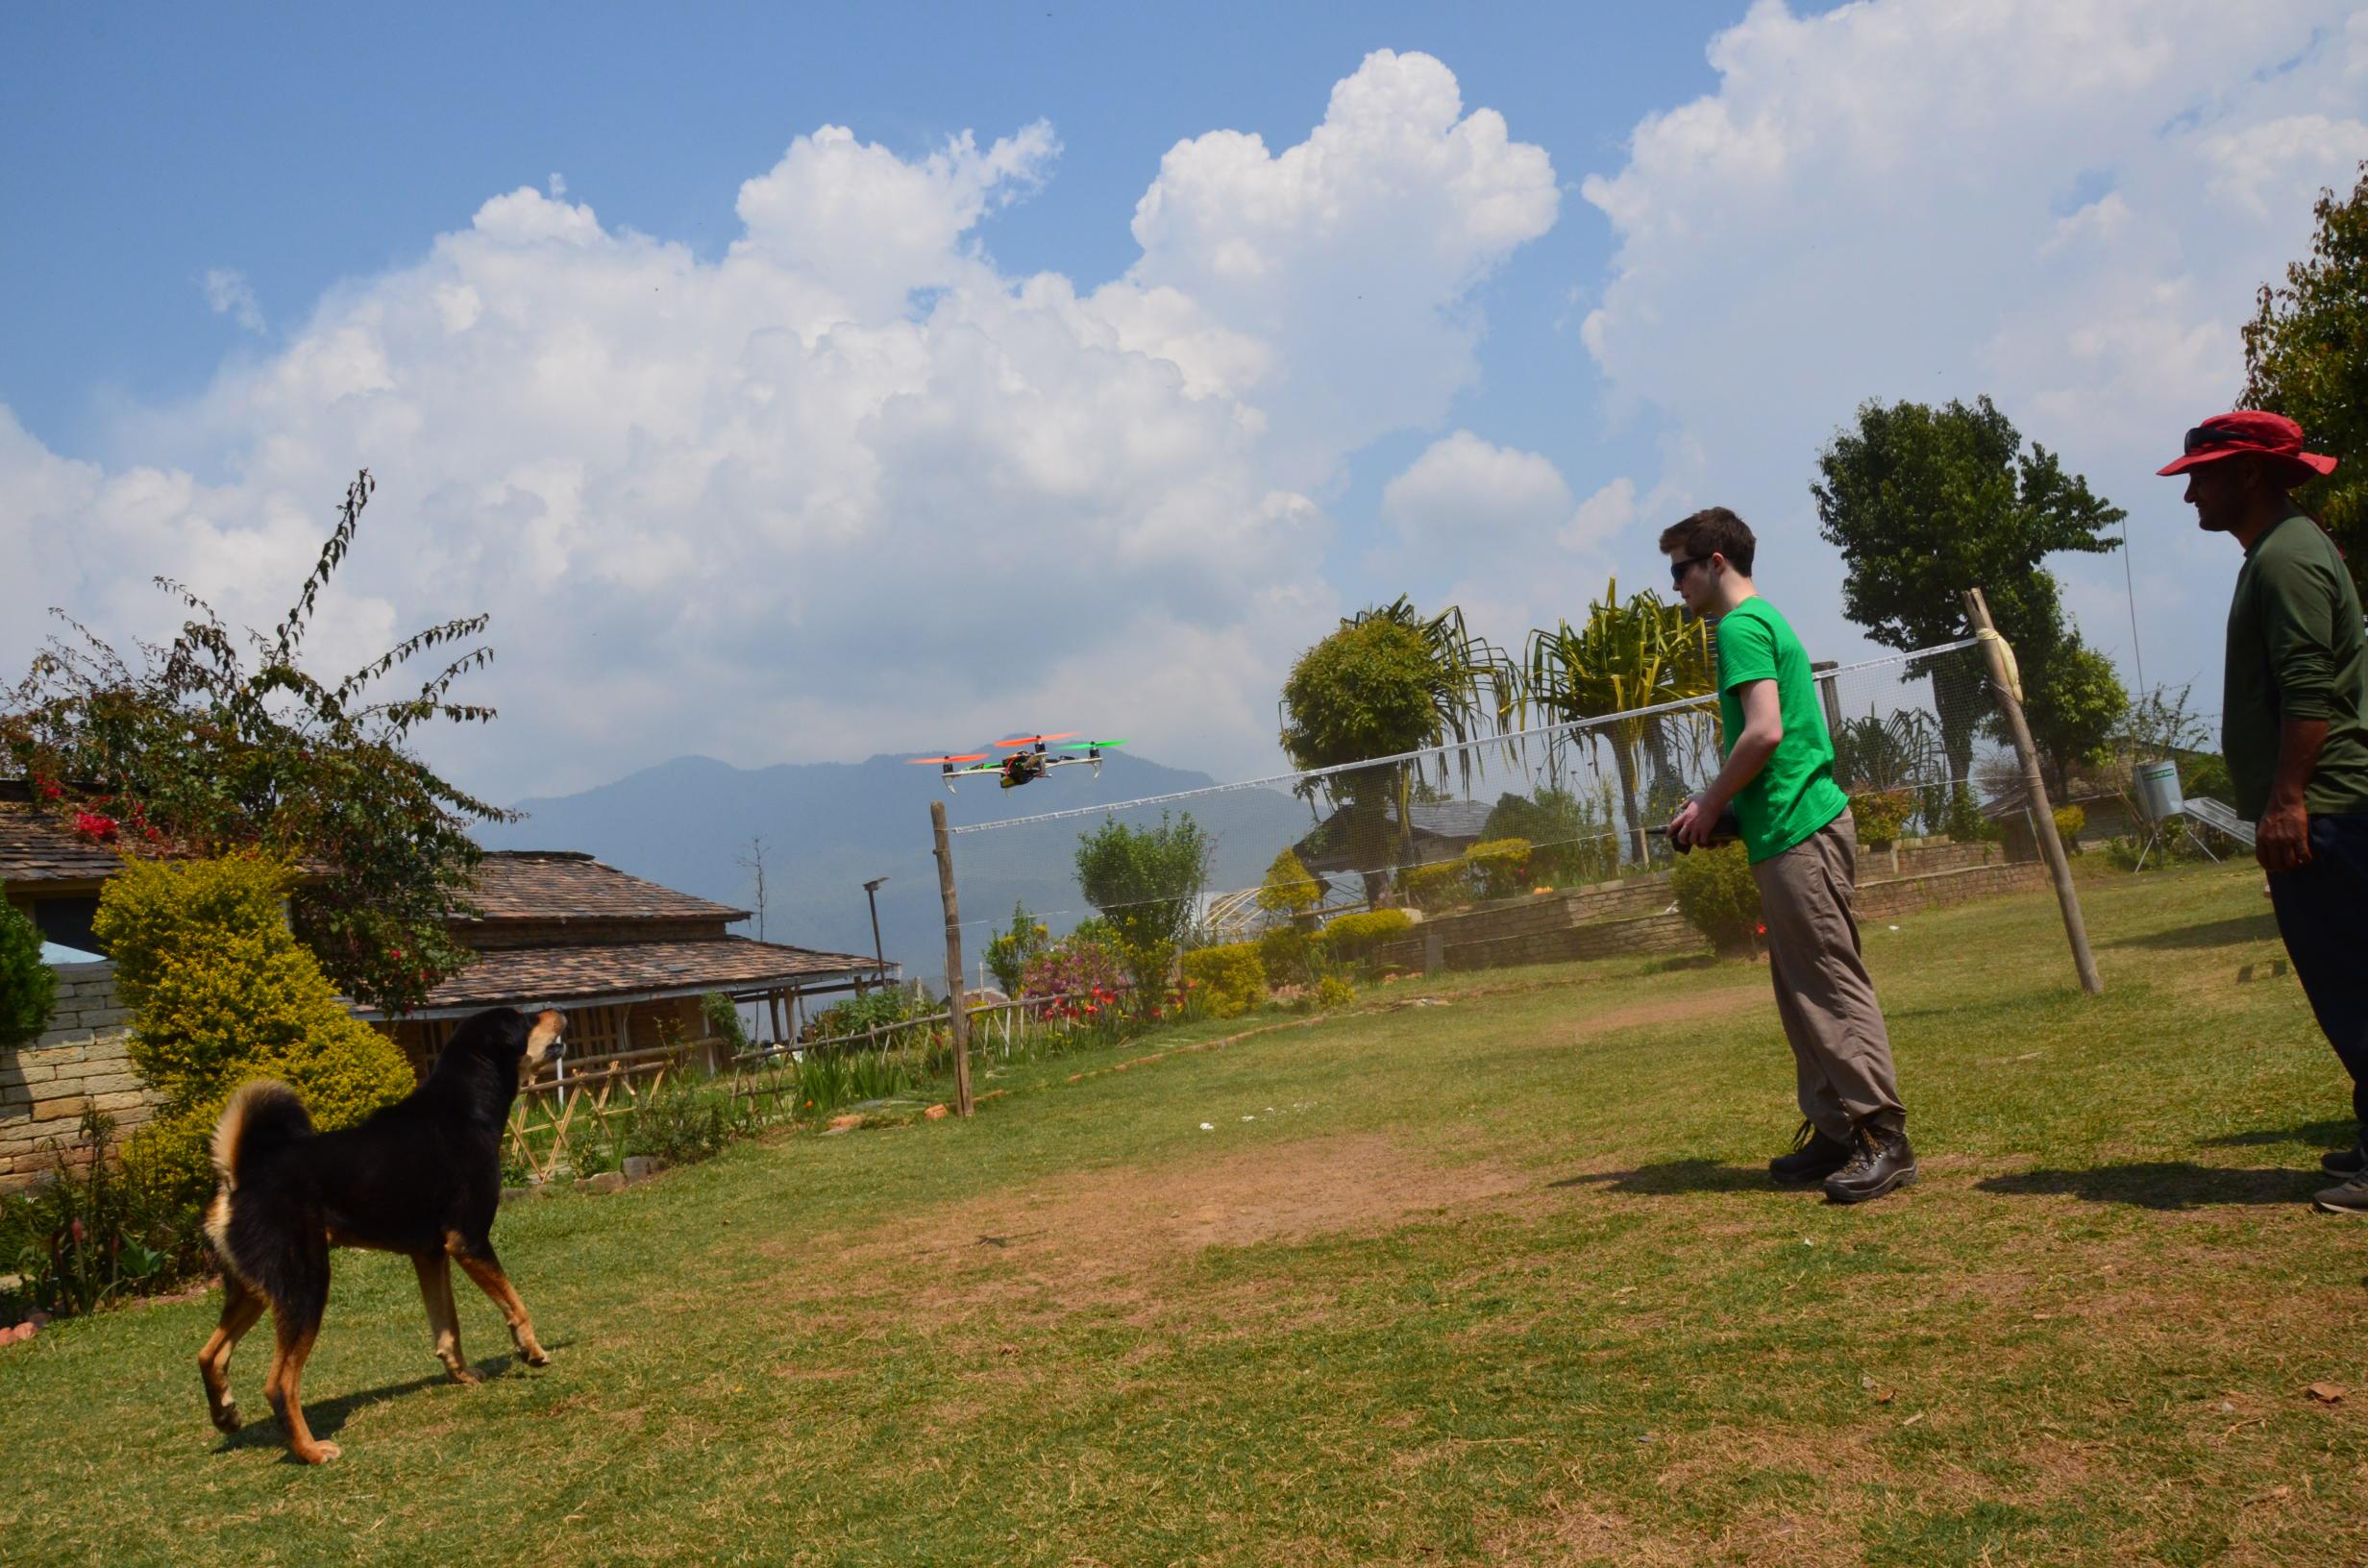 mck-3-23-15-mck-drone-flight-dog-pokhara-region-DSC_1700.jpg